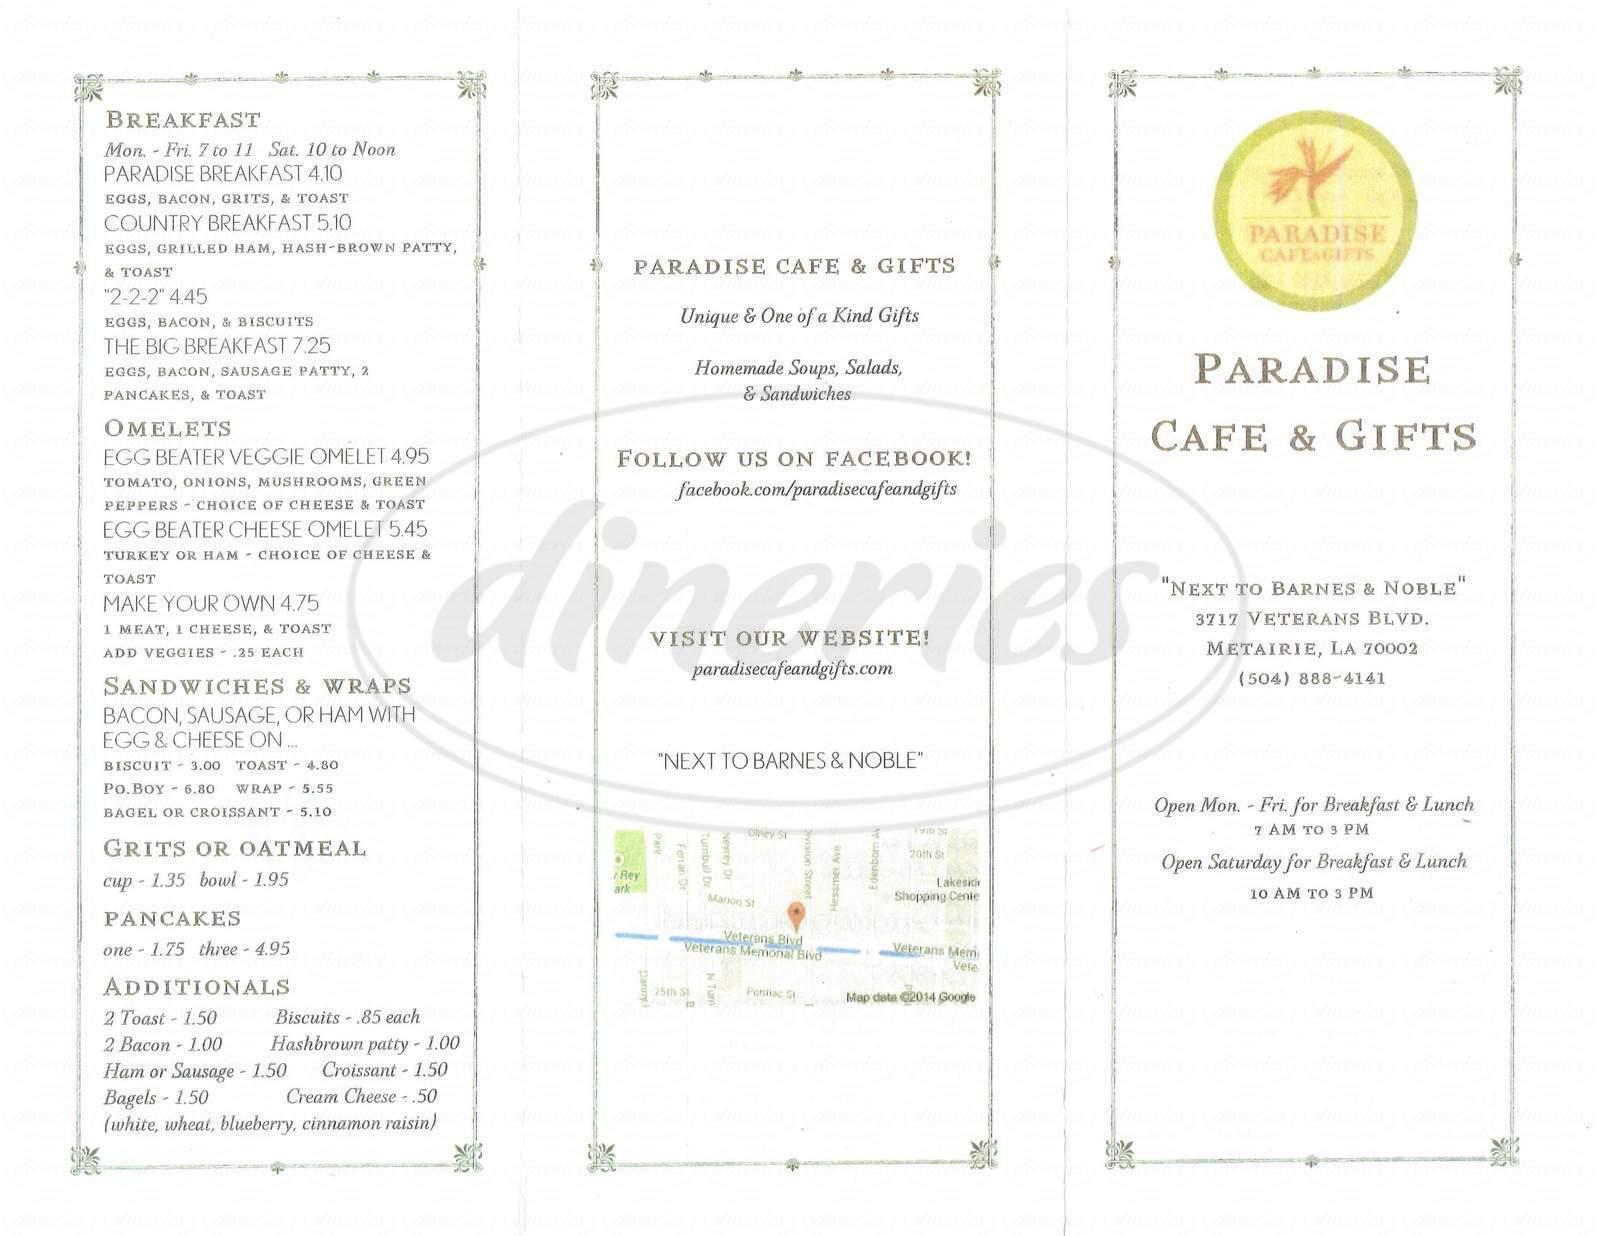 menu for Paradise Cafe